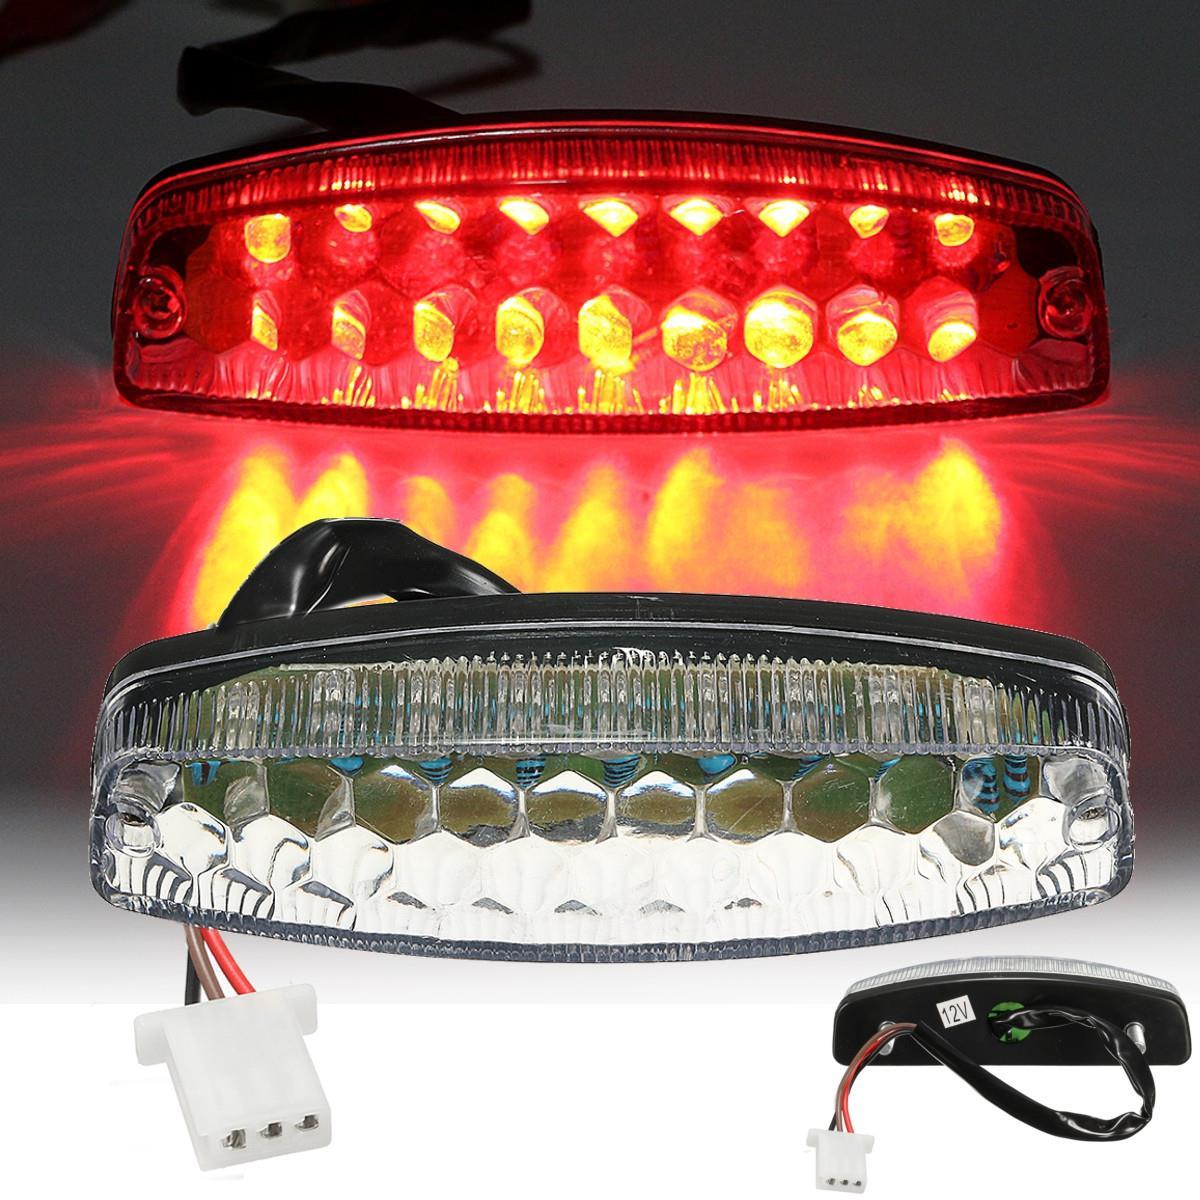 ATV Front Light Headlight For 50cc 70cc 90cc 110cc 125cc